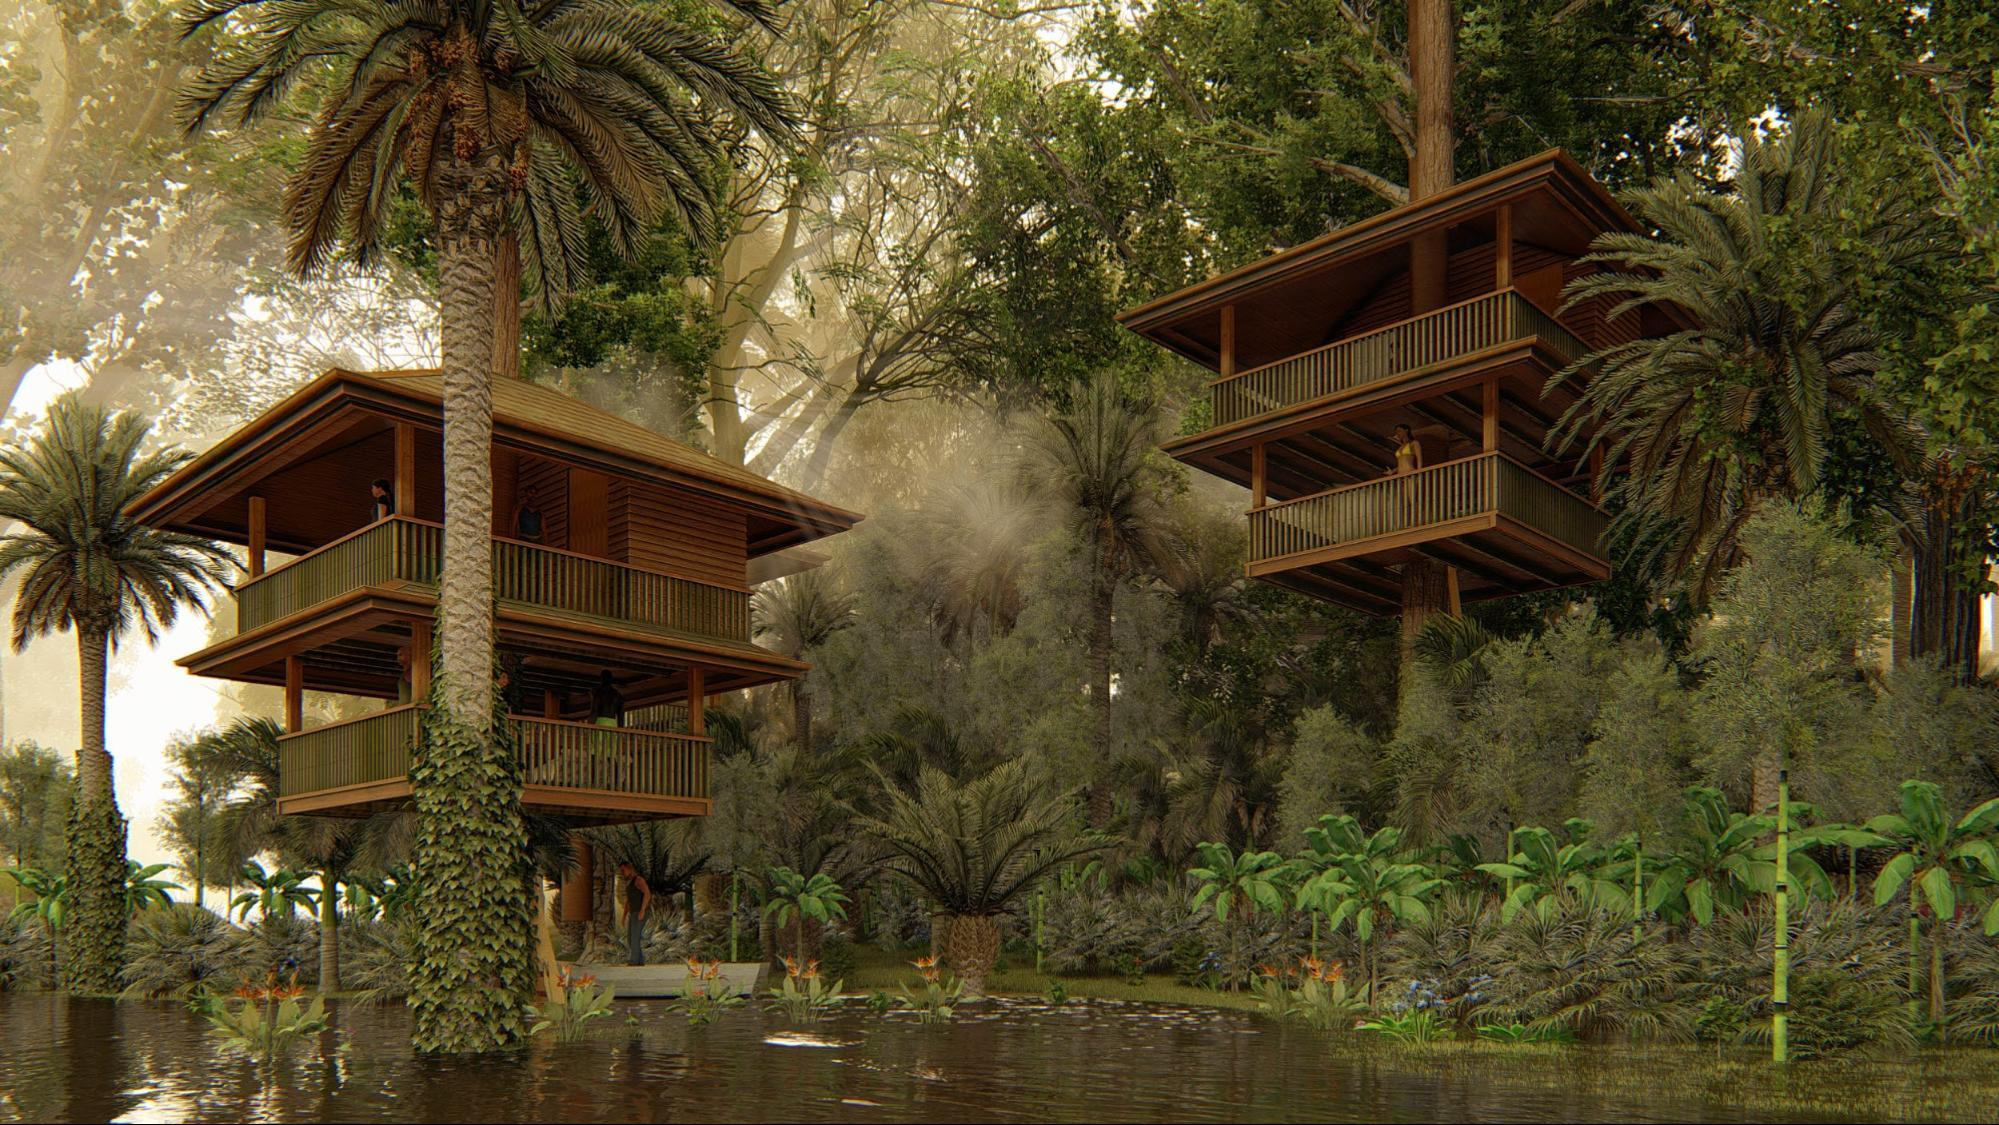 Landscape Architecture Rendering